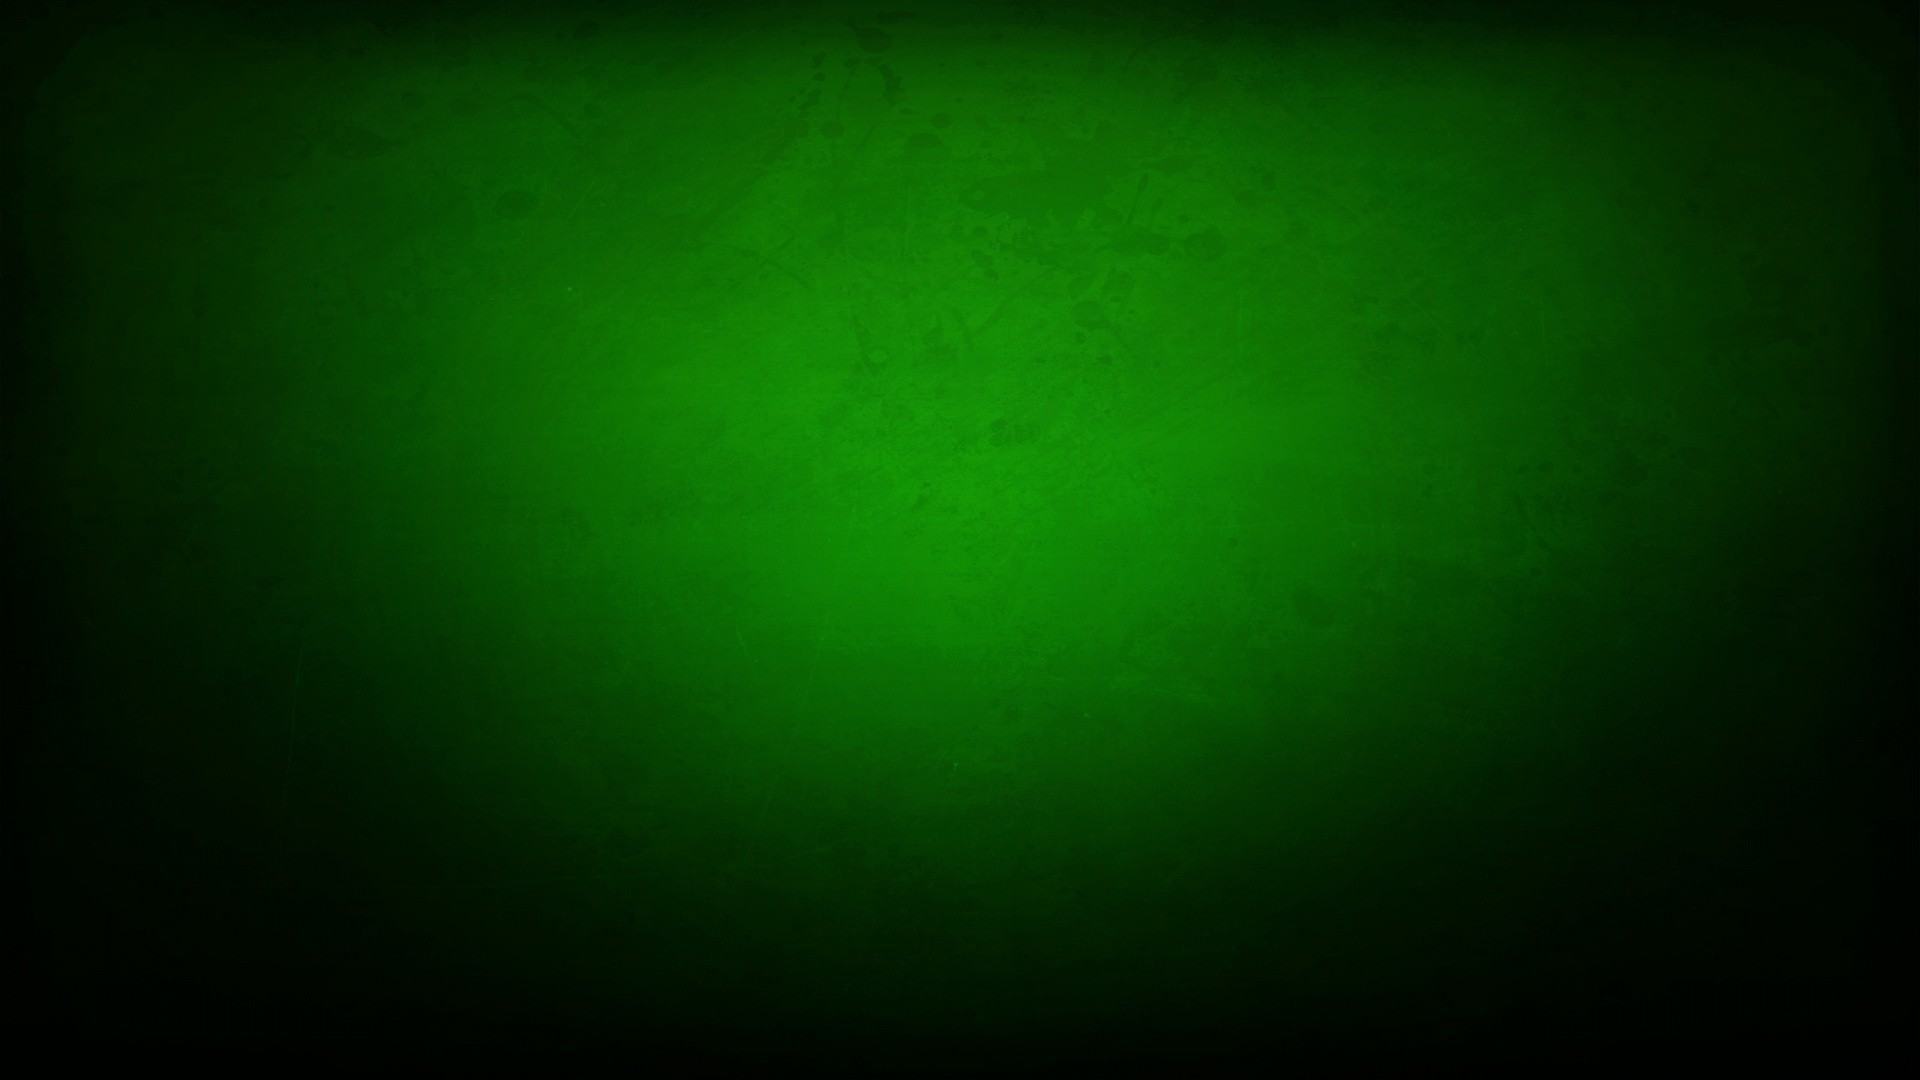 1920x1080 Wallpaperwiki Free Photos Emerald Green HD PIC